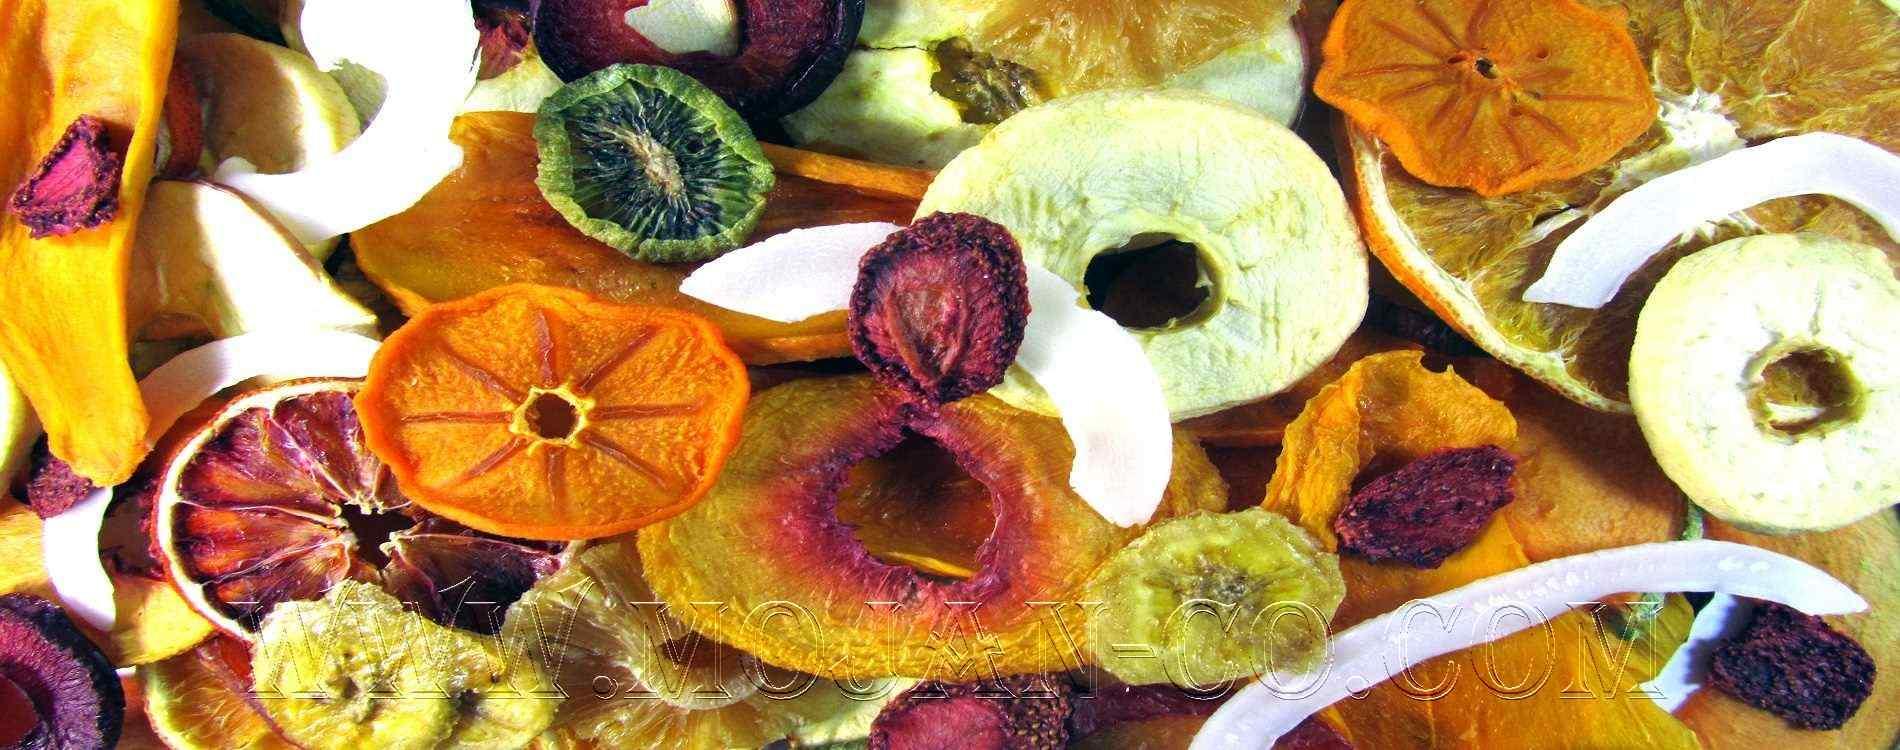 چیپس میوه موژان مخلوط